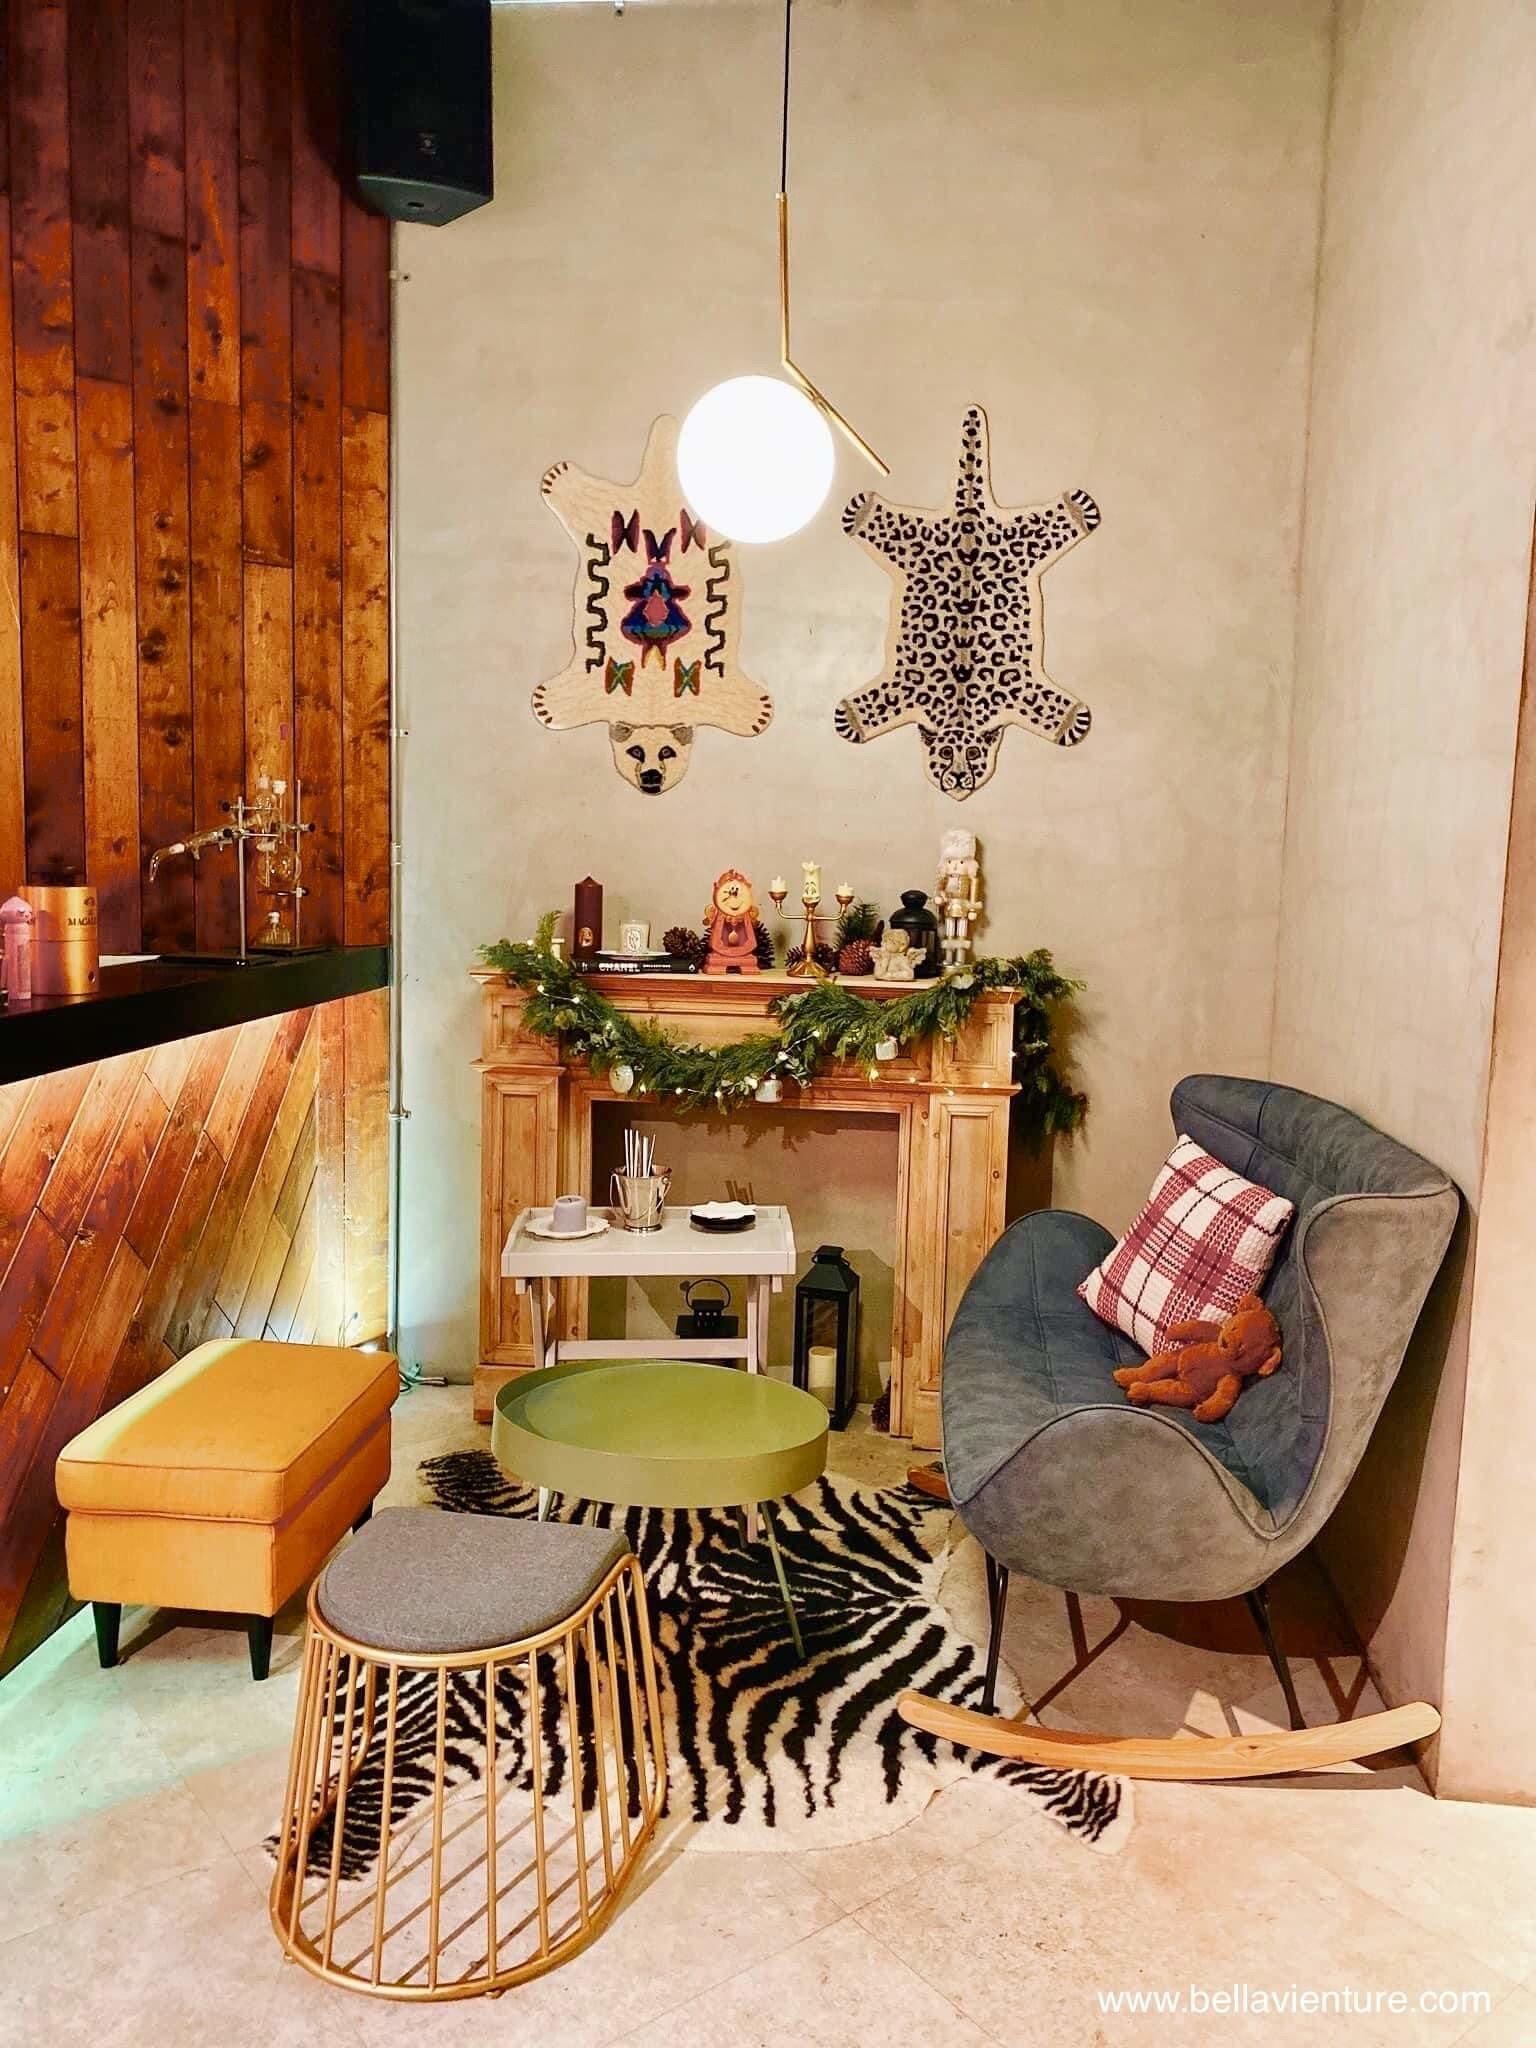 台北 信義區 She_Design TAPAS SOJU BAR 餐廳座位